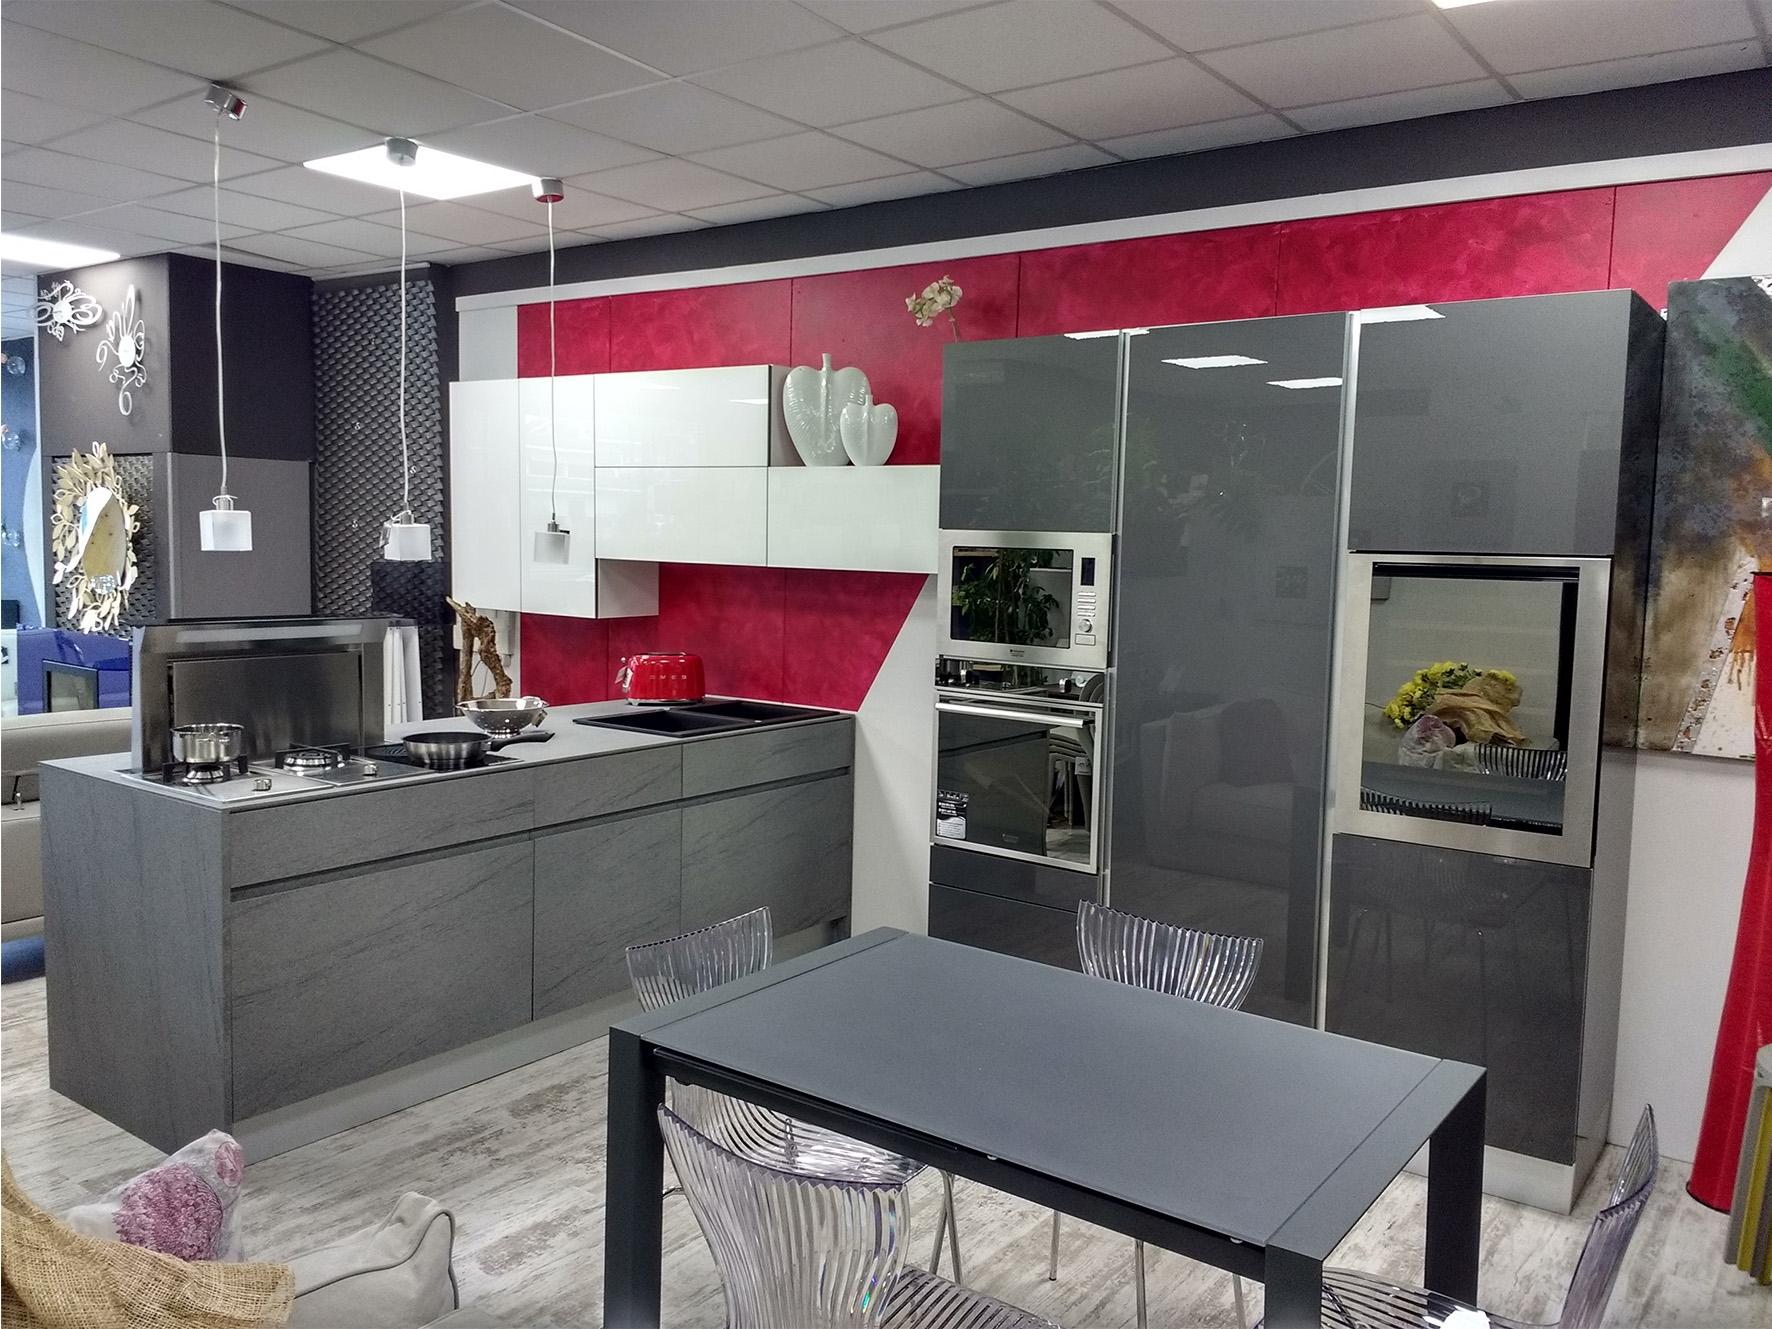 Cucine con isola gory cucine mod geo 45 monolite - Cucine a induzione consumi ...